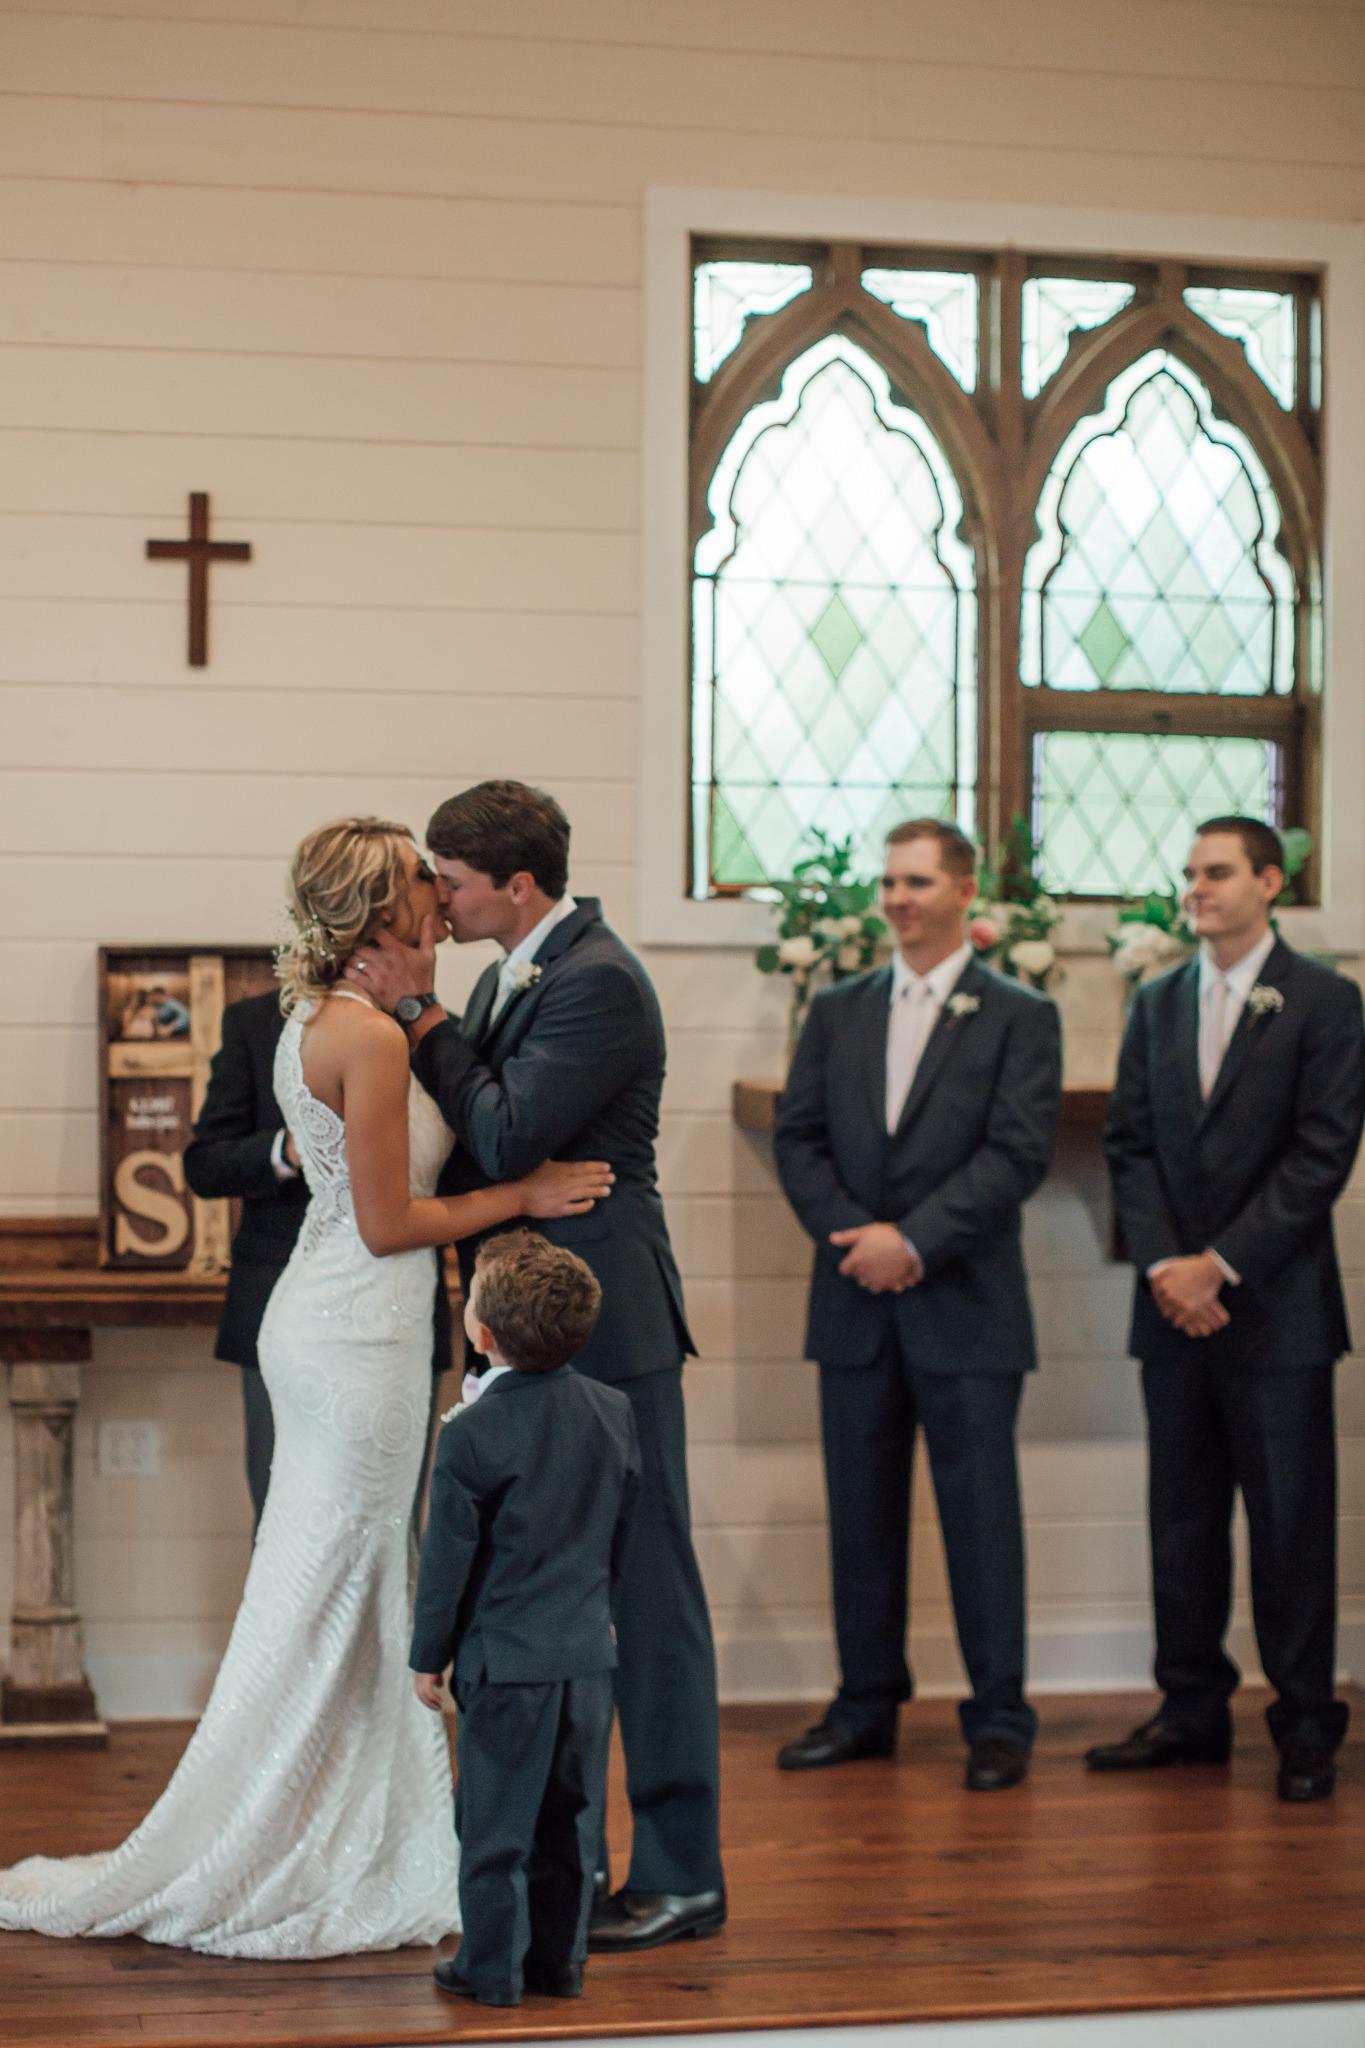 cassie-cook-photography-memphis-wedding-photographer-hedge-farm-wedding-venue-233.jpg